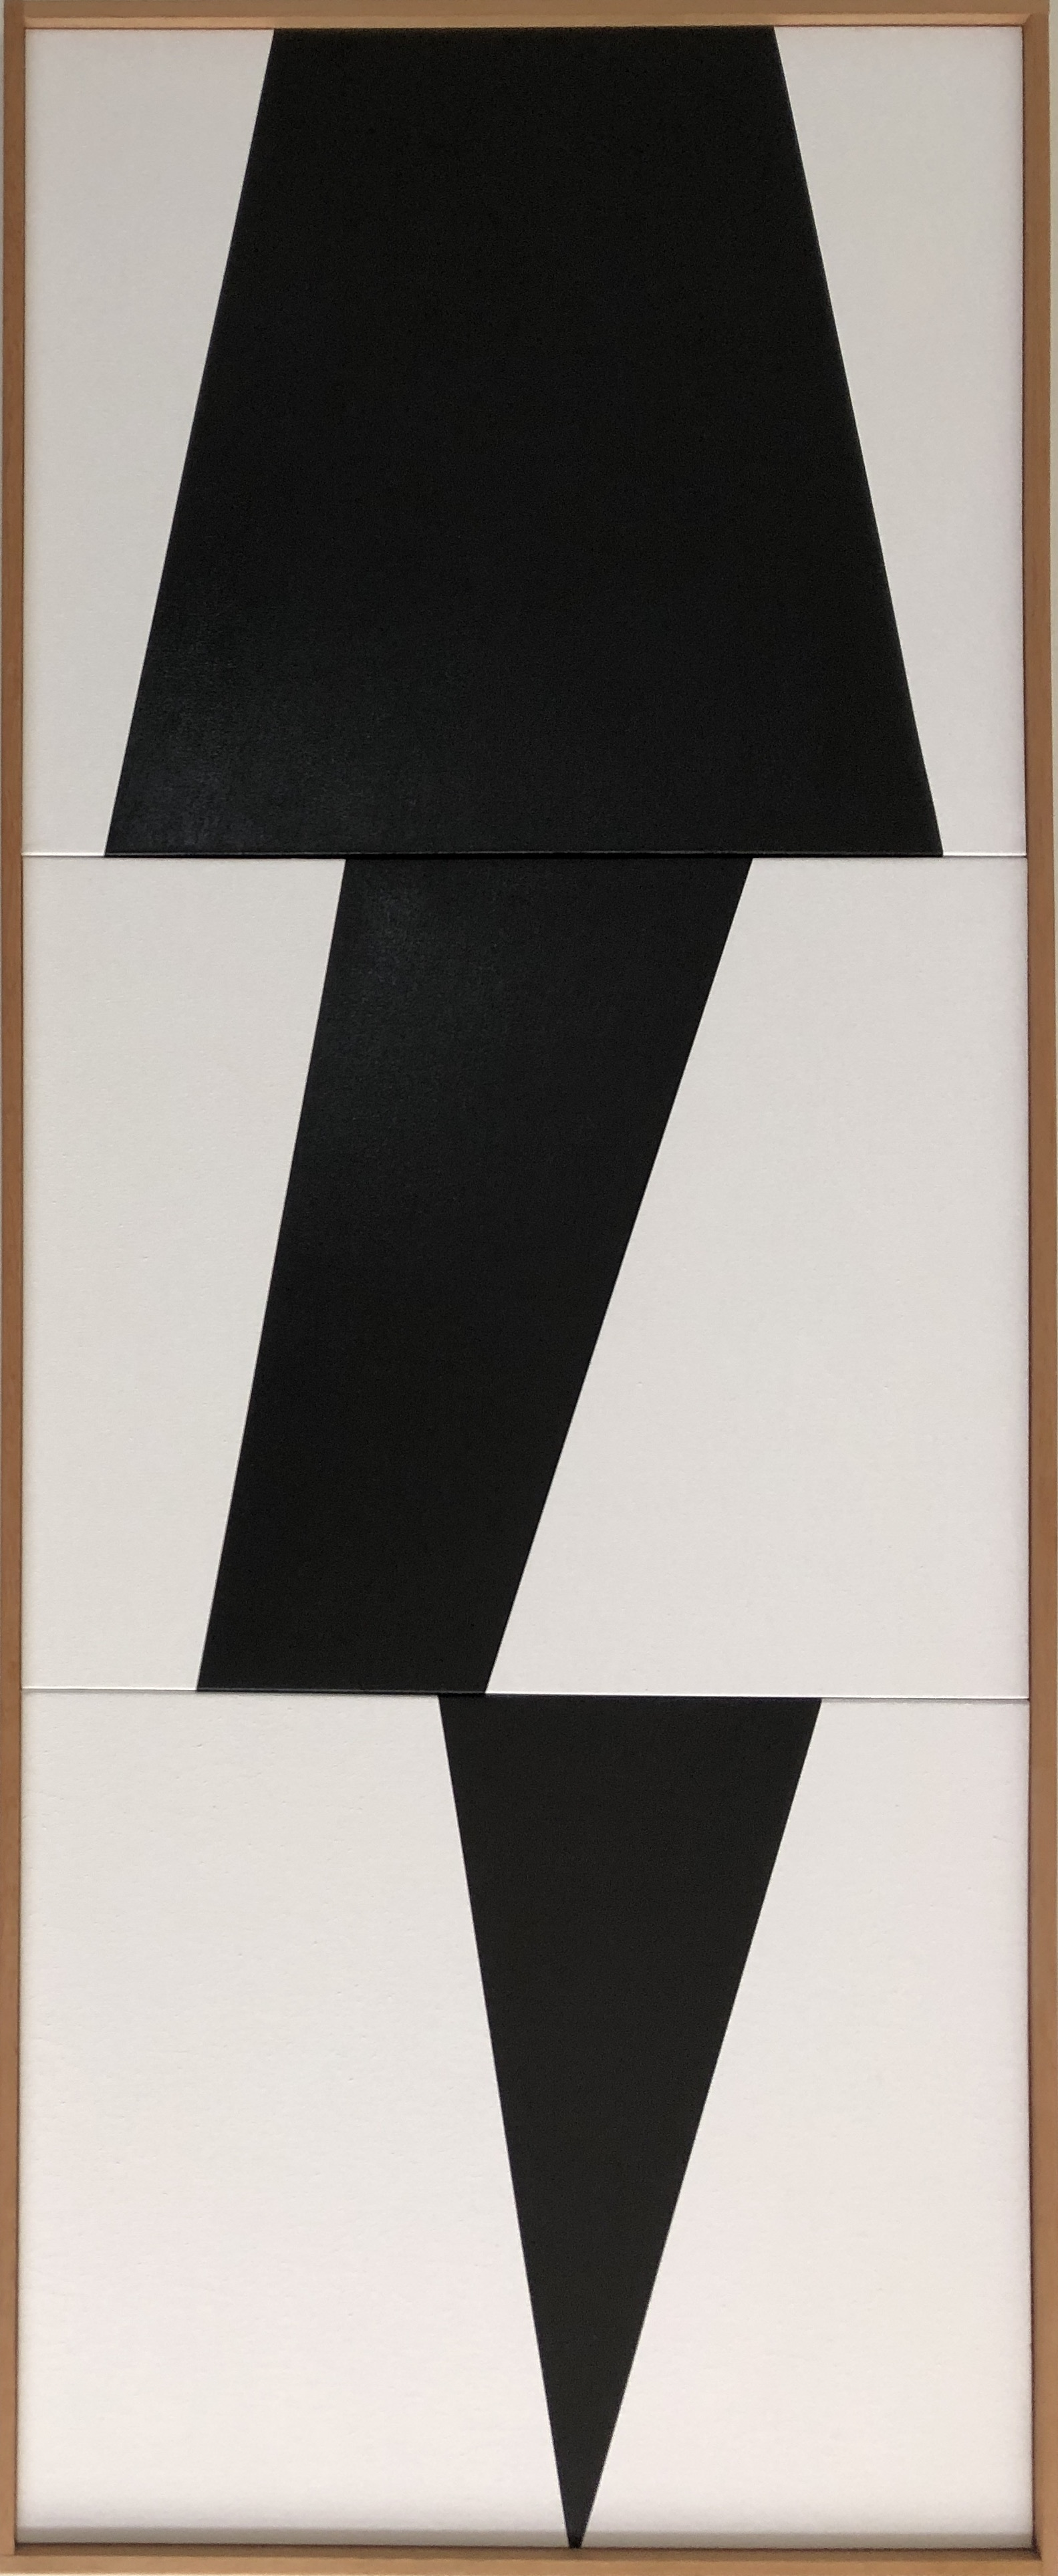 Black Jagged Triptych JET0642 - Image 1.JPG